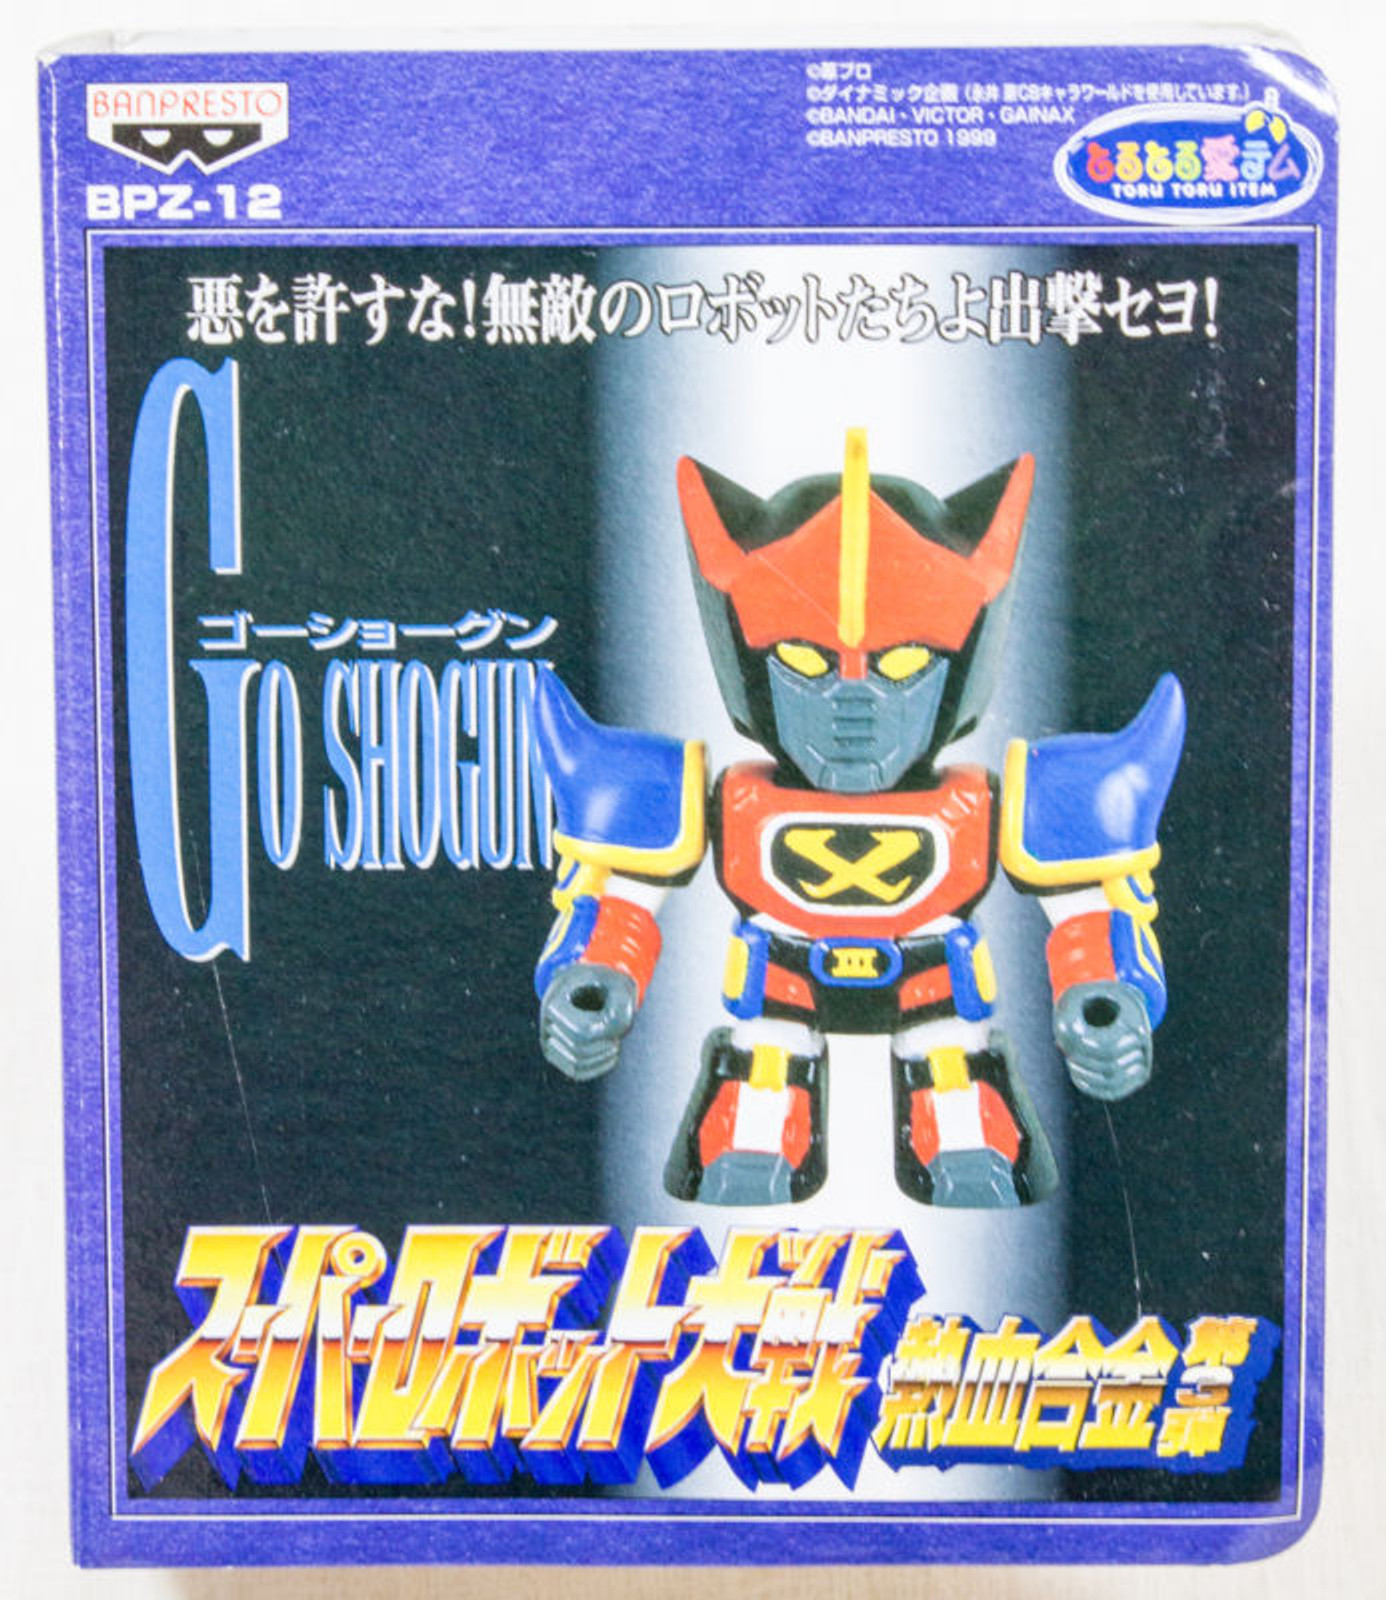 GO SHOGUN Figure Super Robot Wars Nekketsu Gokin Banpresto JAPAN ANIME